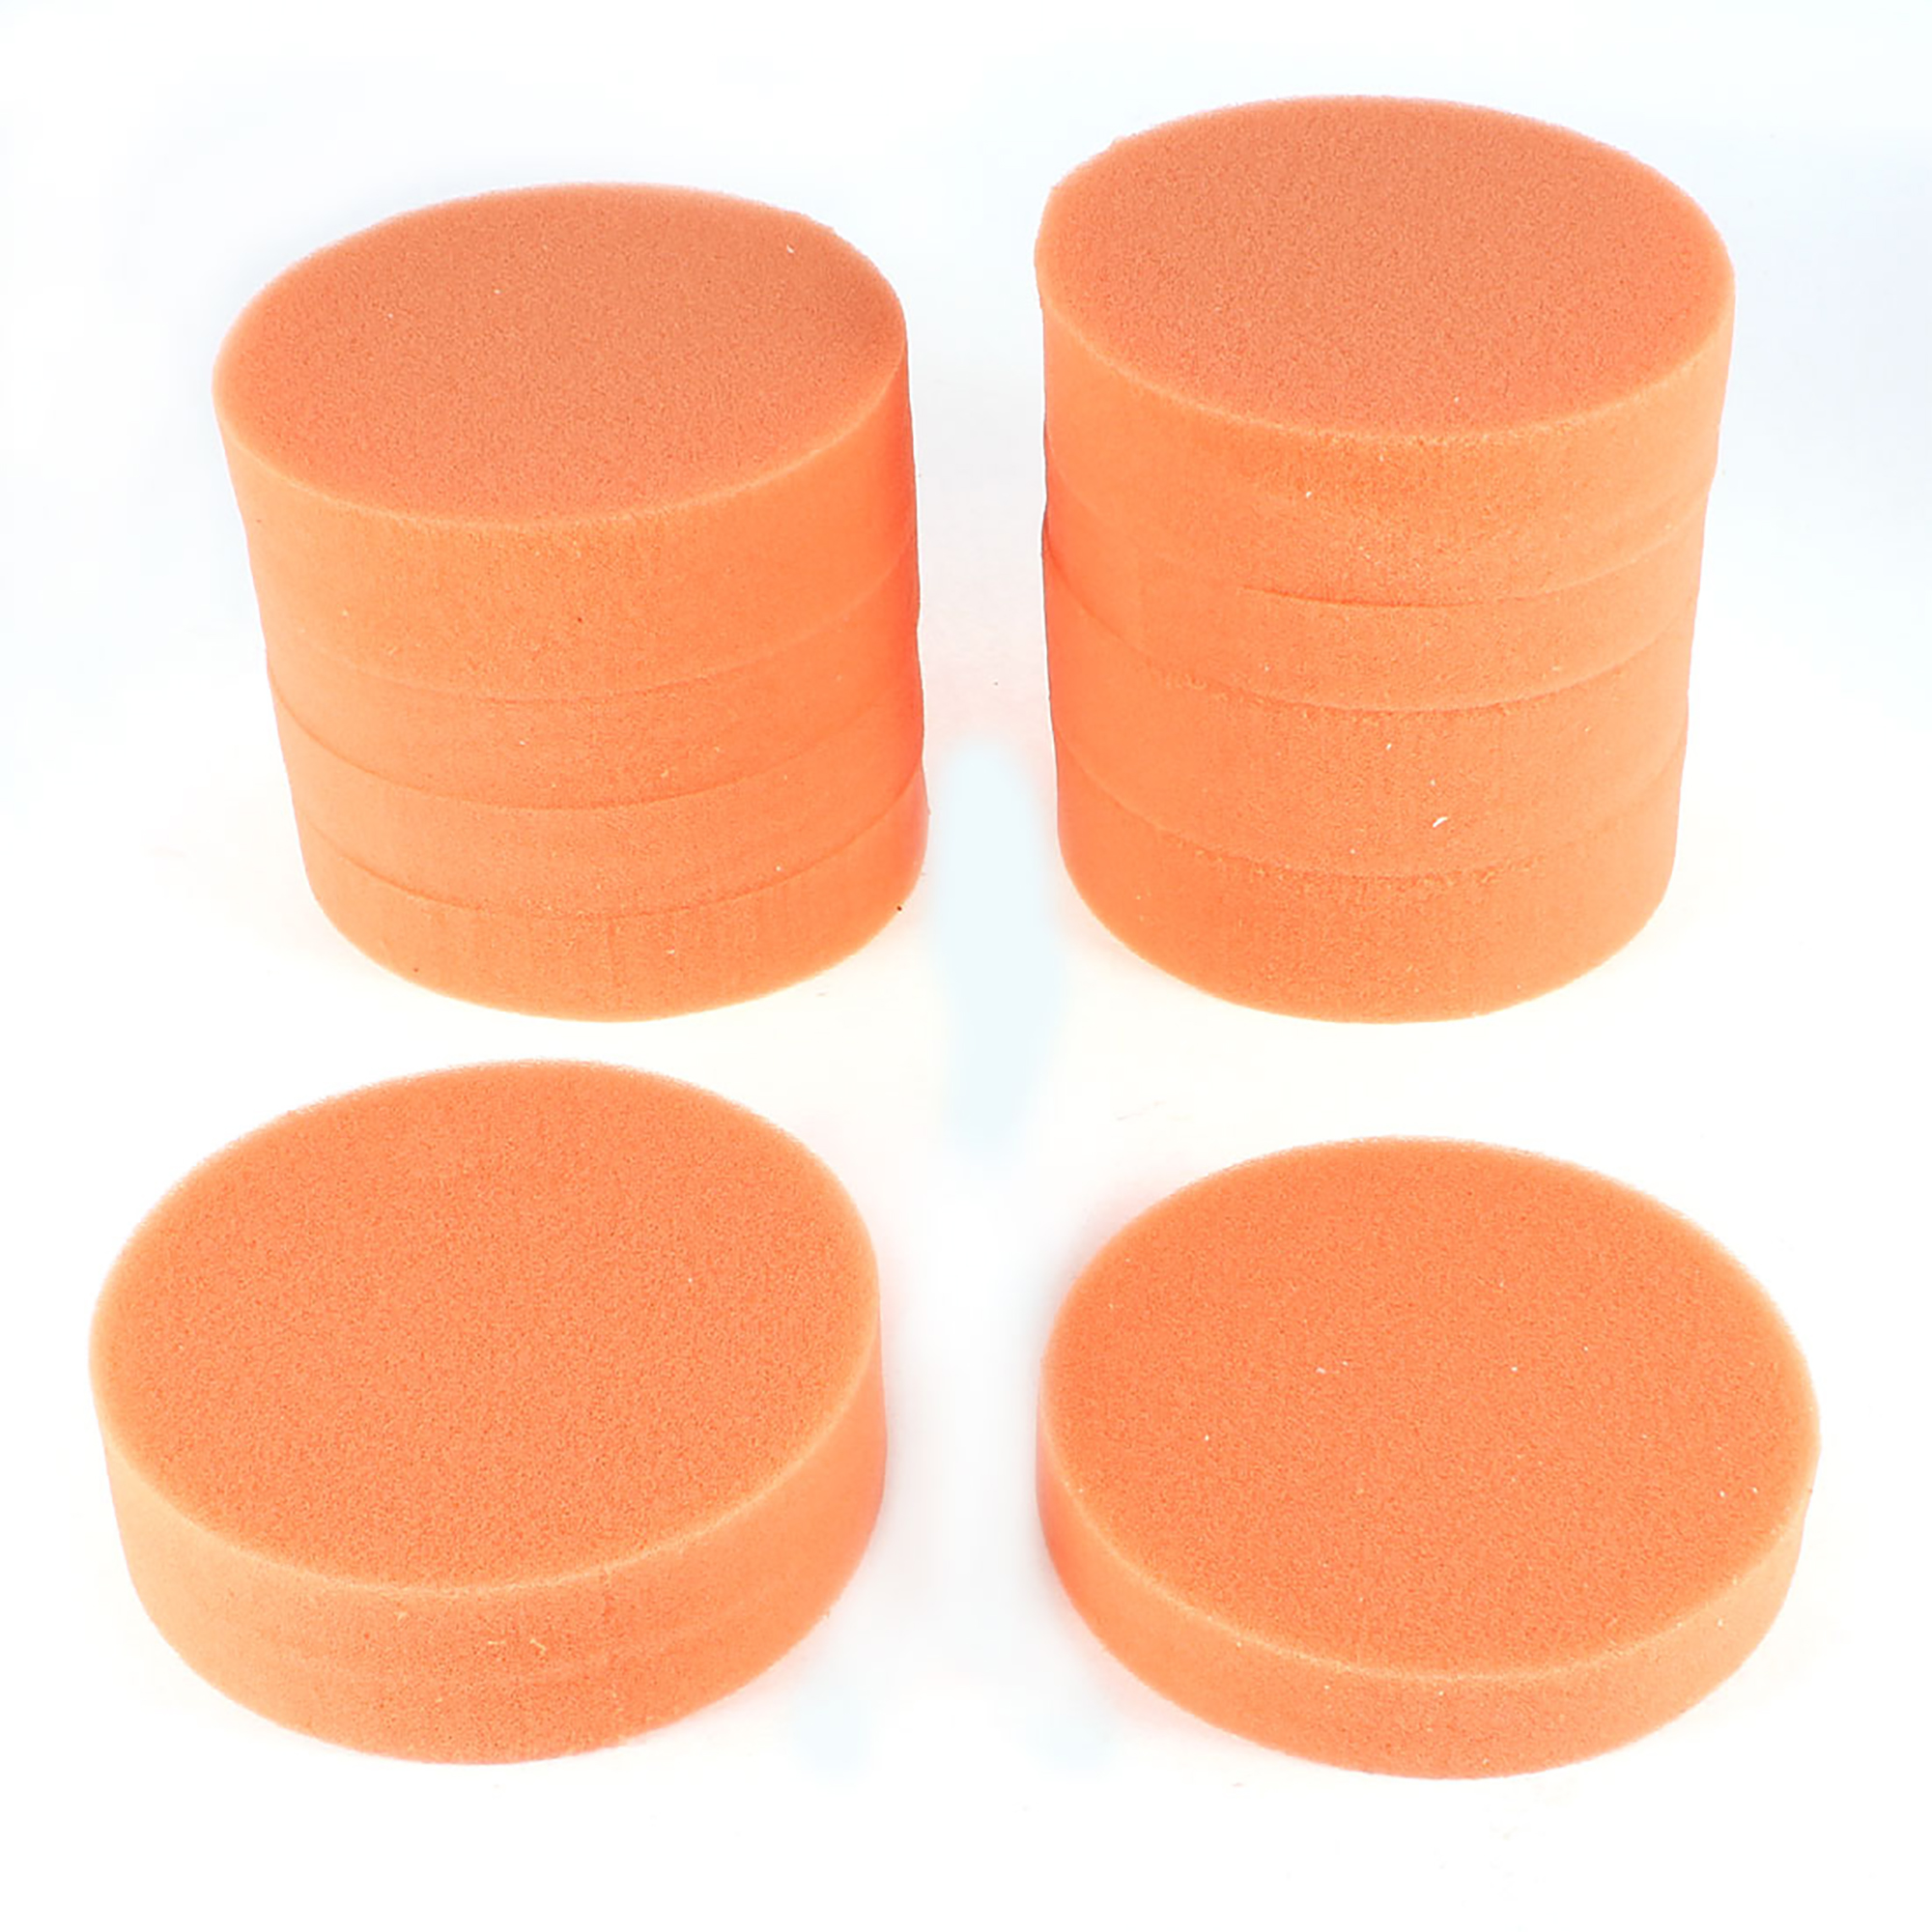 "10 Pcs Home Car Washing Cleaning Waxing 4"" Dia Round Sponge Pads Orange"